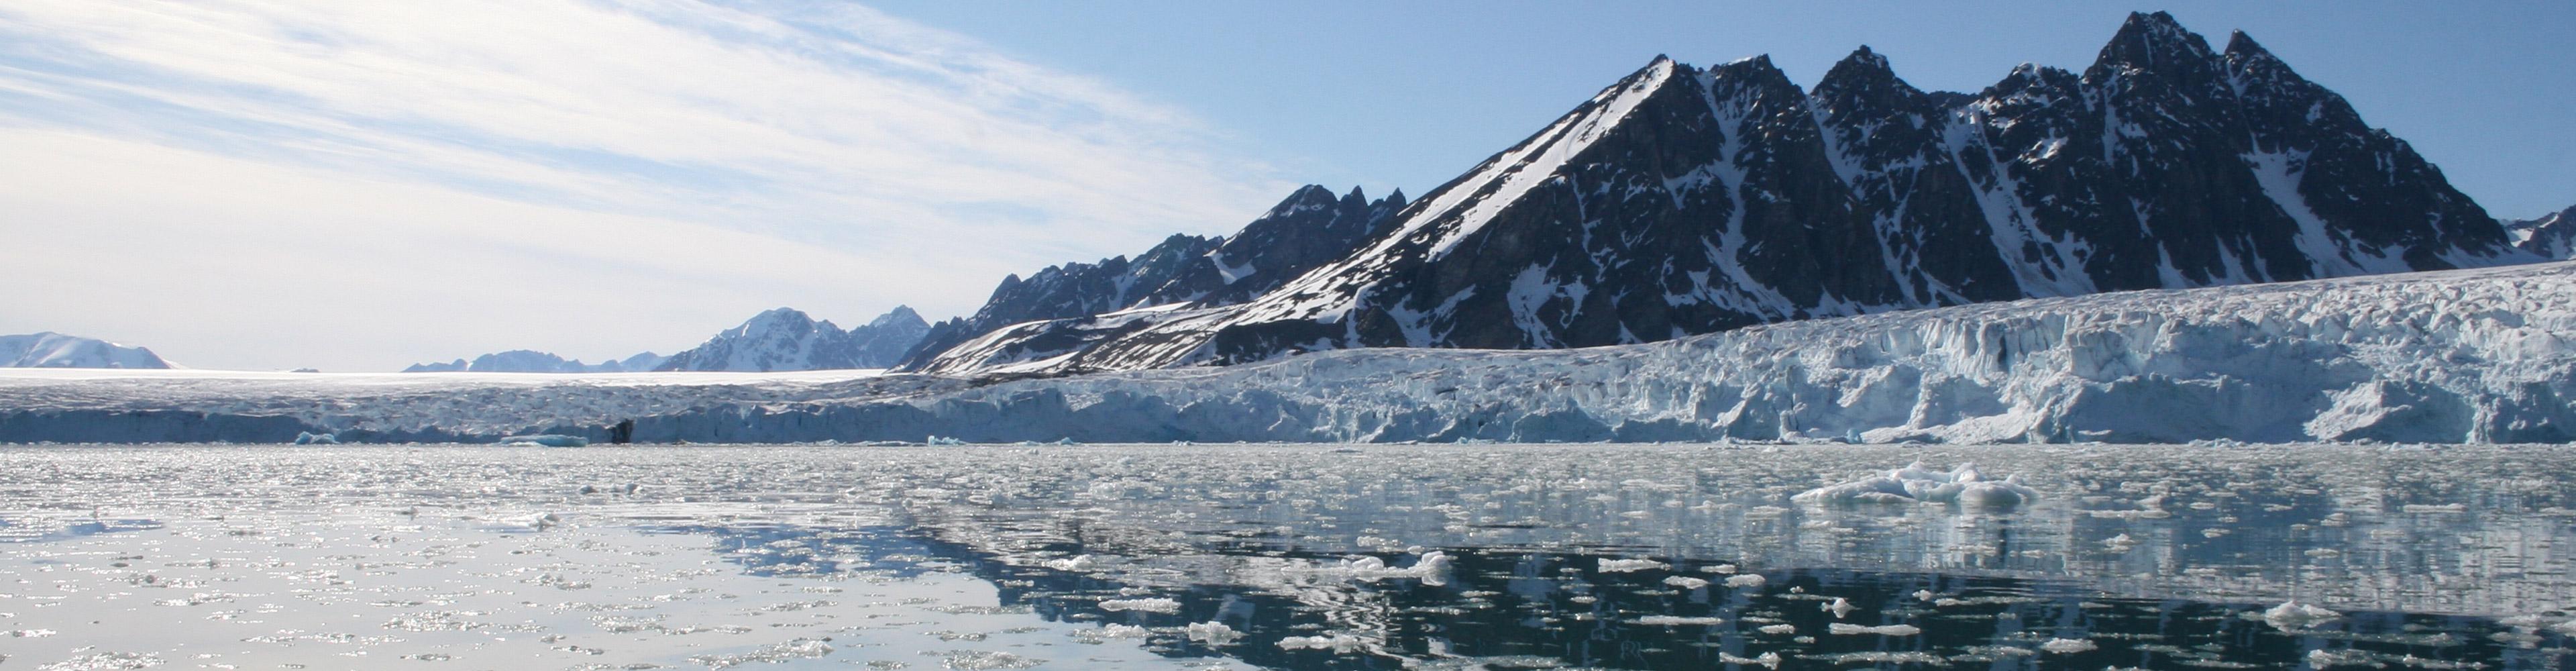 Spitsbergen Highlights